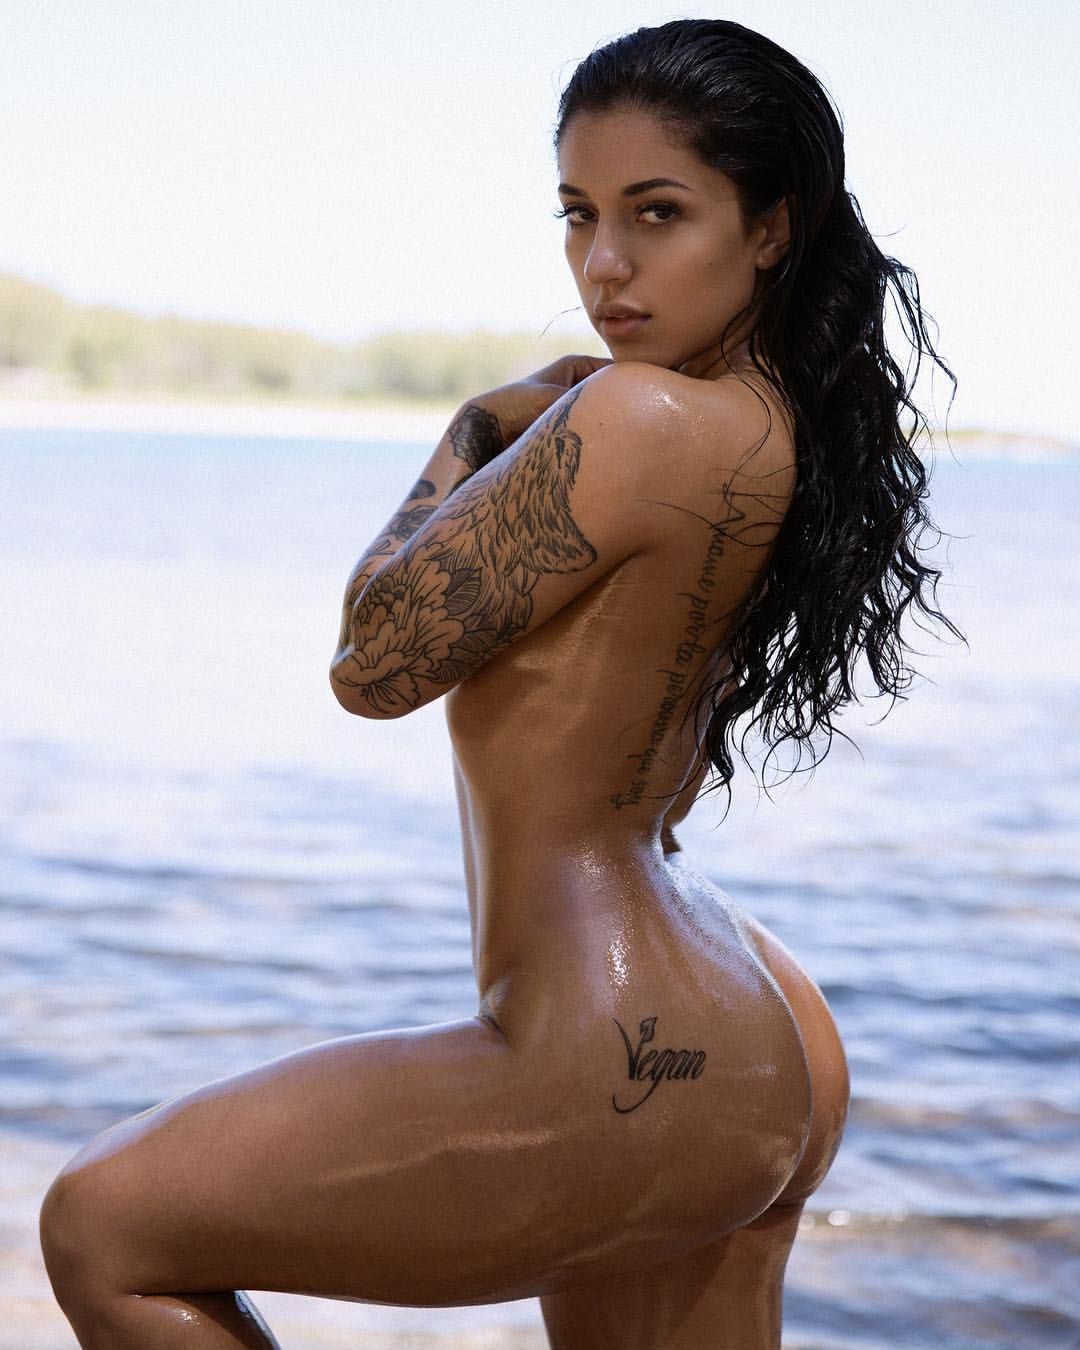 bianca taylor nude